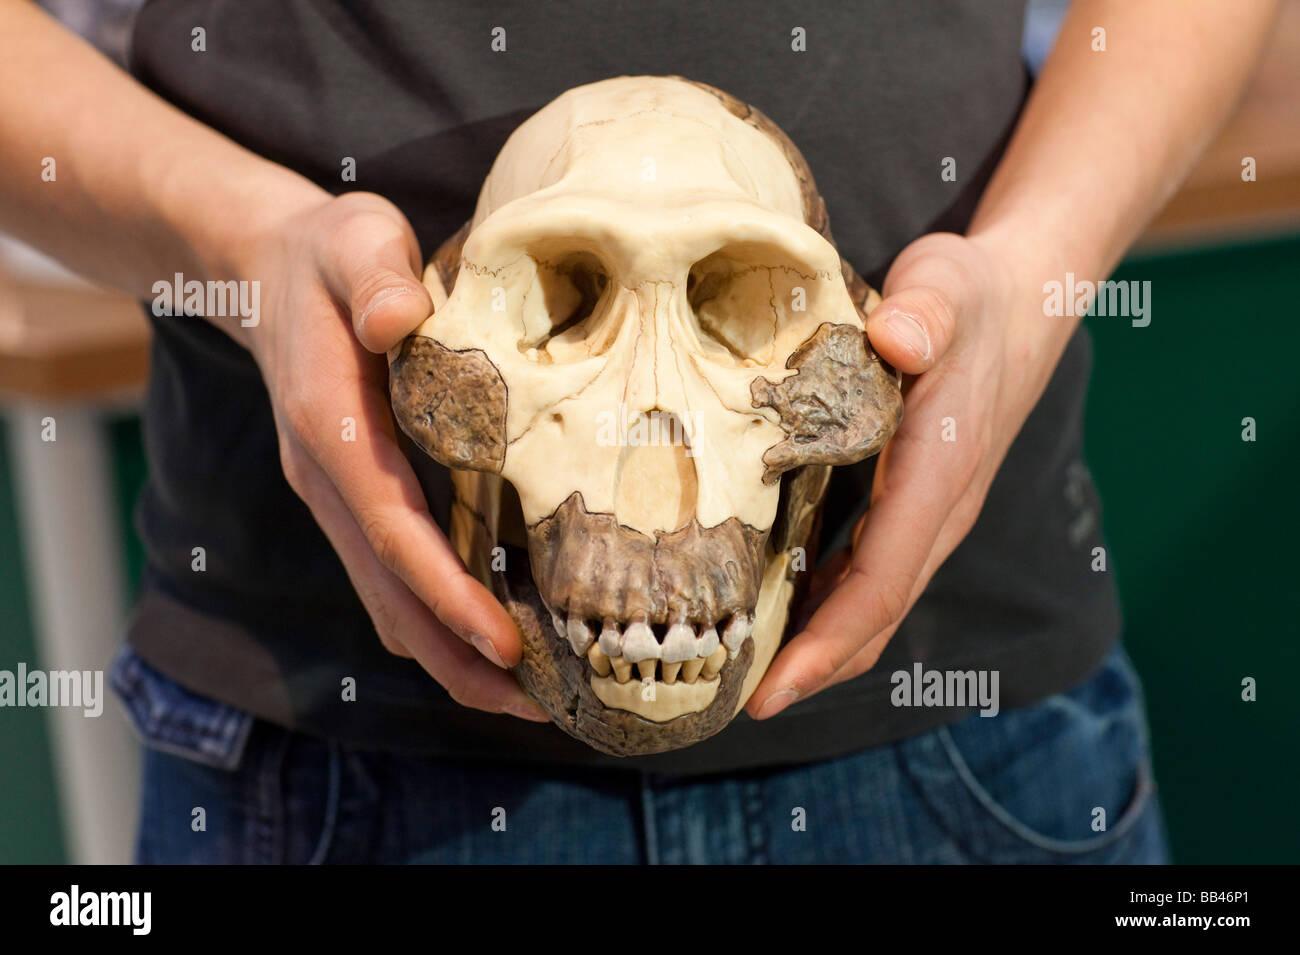 Chimpanzee skull - Stock Image